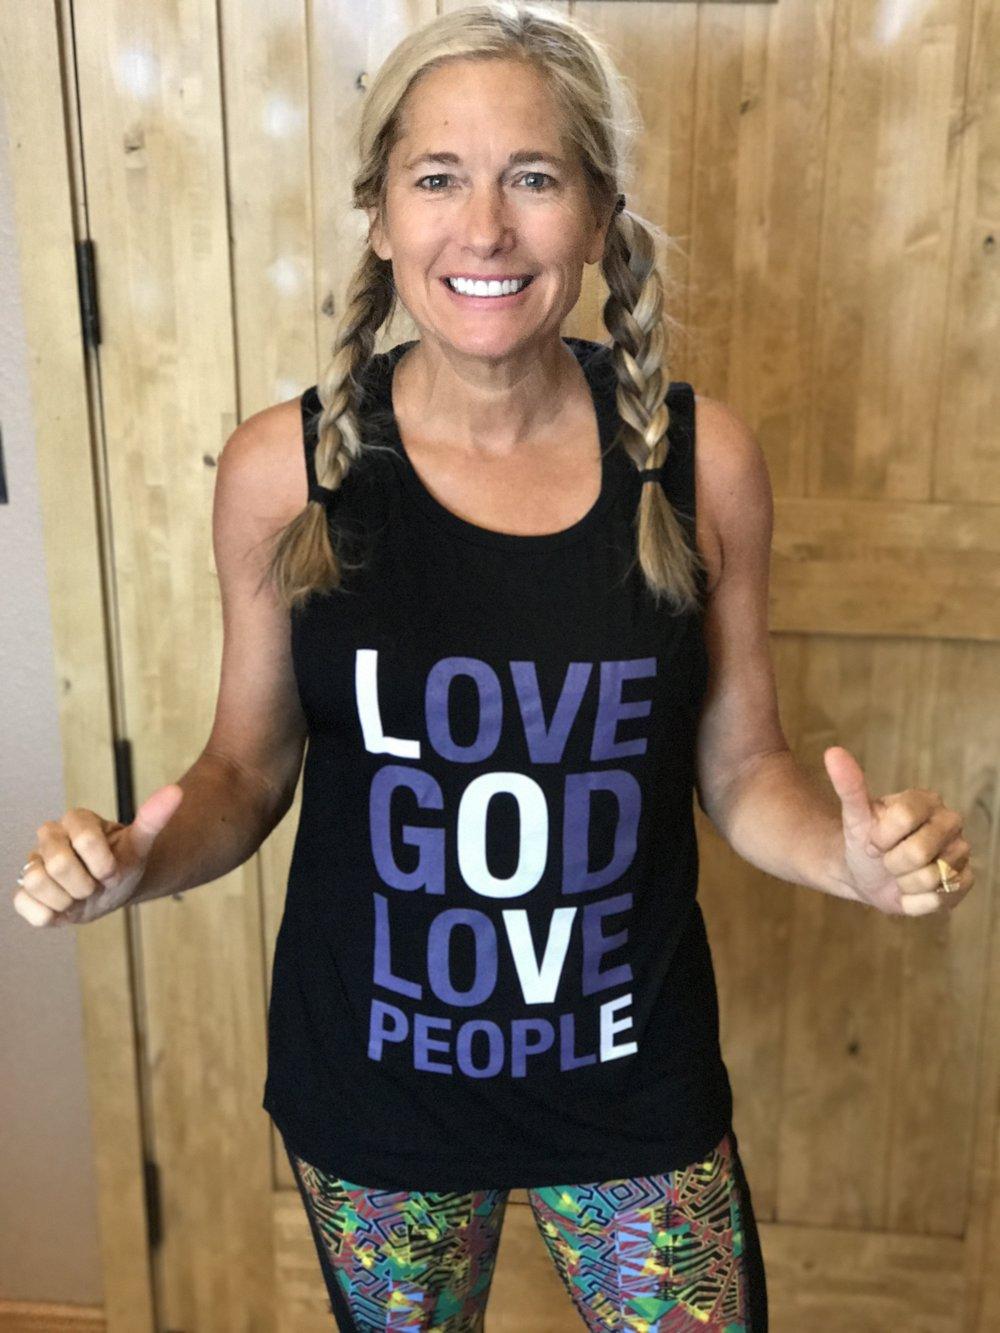 Michelle Spadafora, Founder of Faithful Workouts